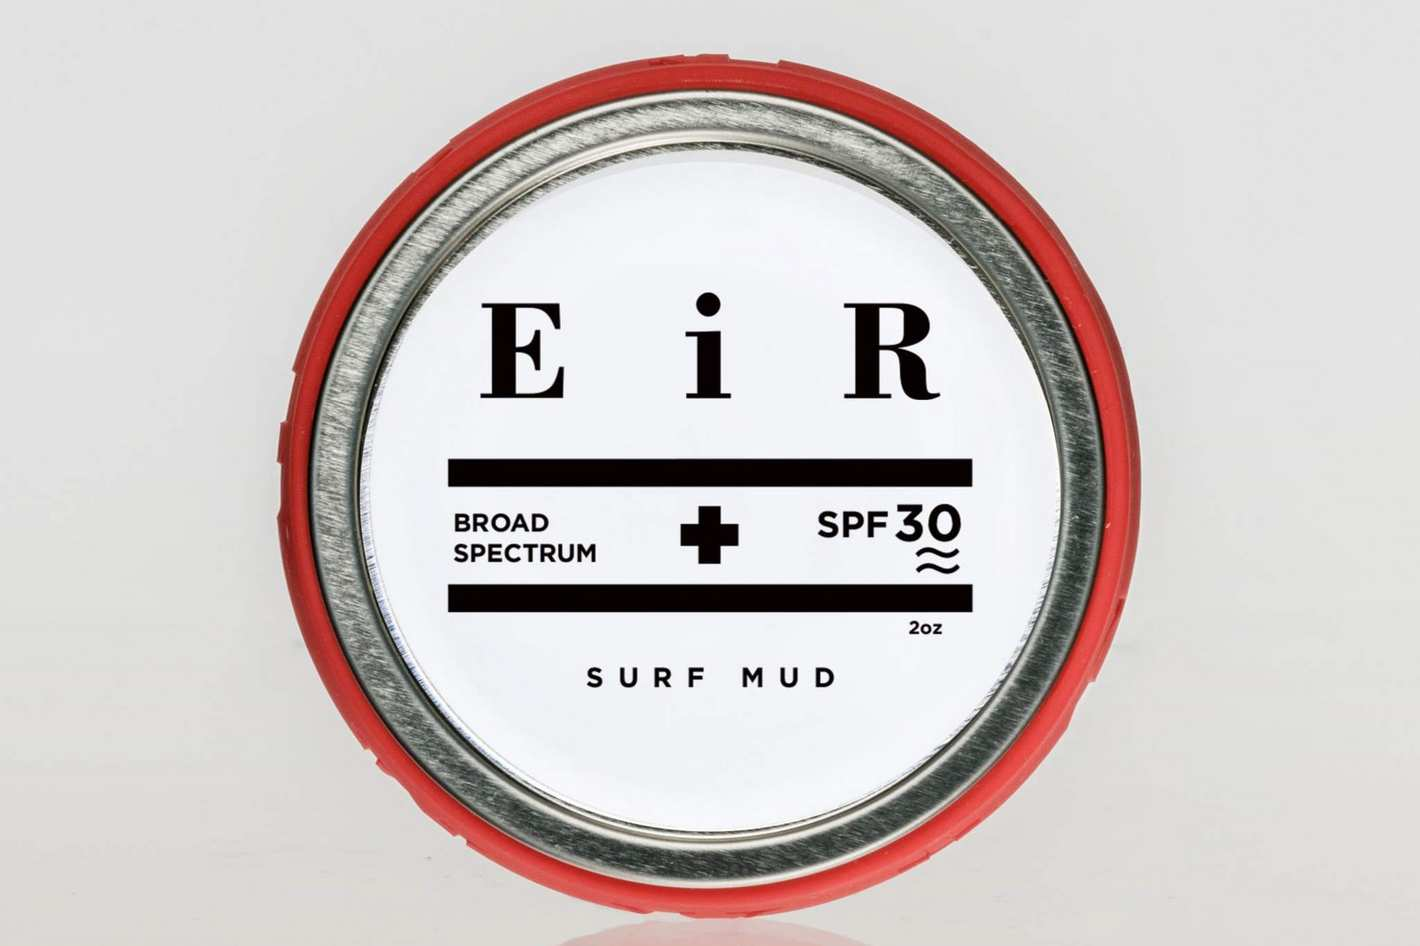 EIR Surf Mud Pro SPF 30